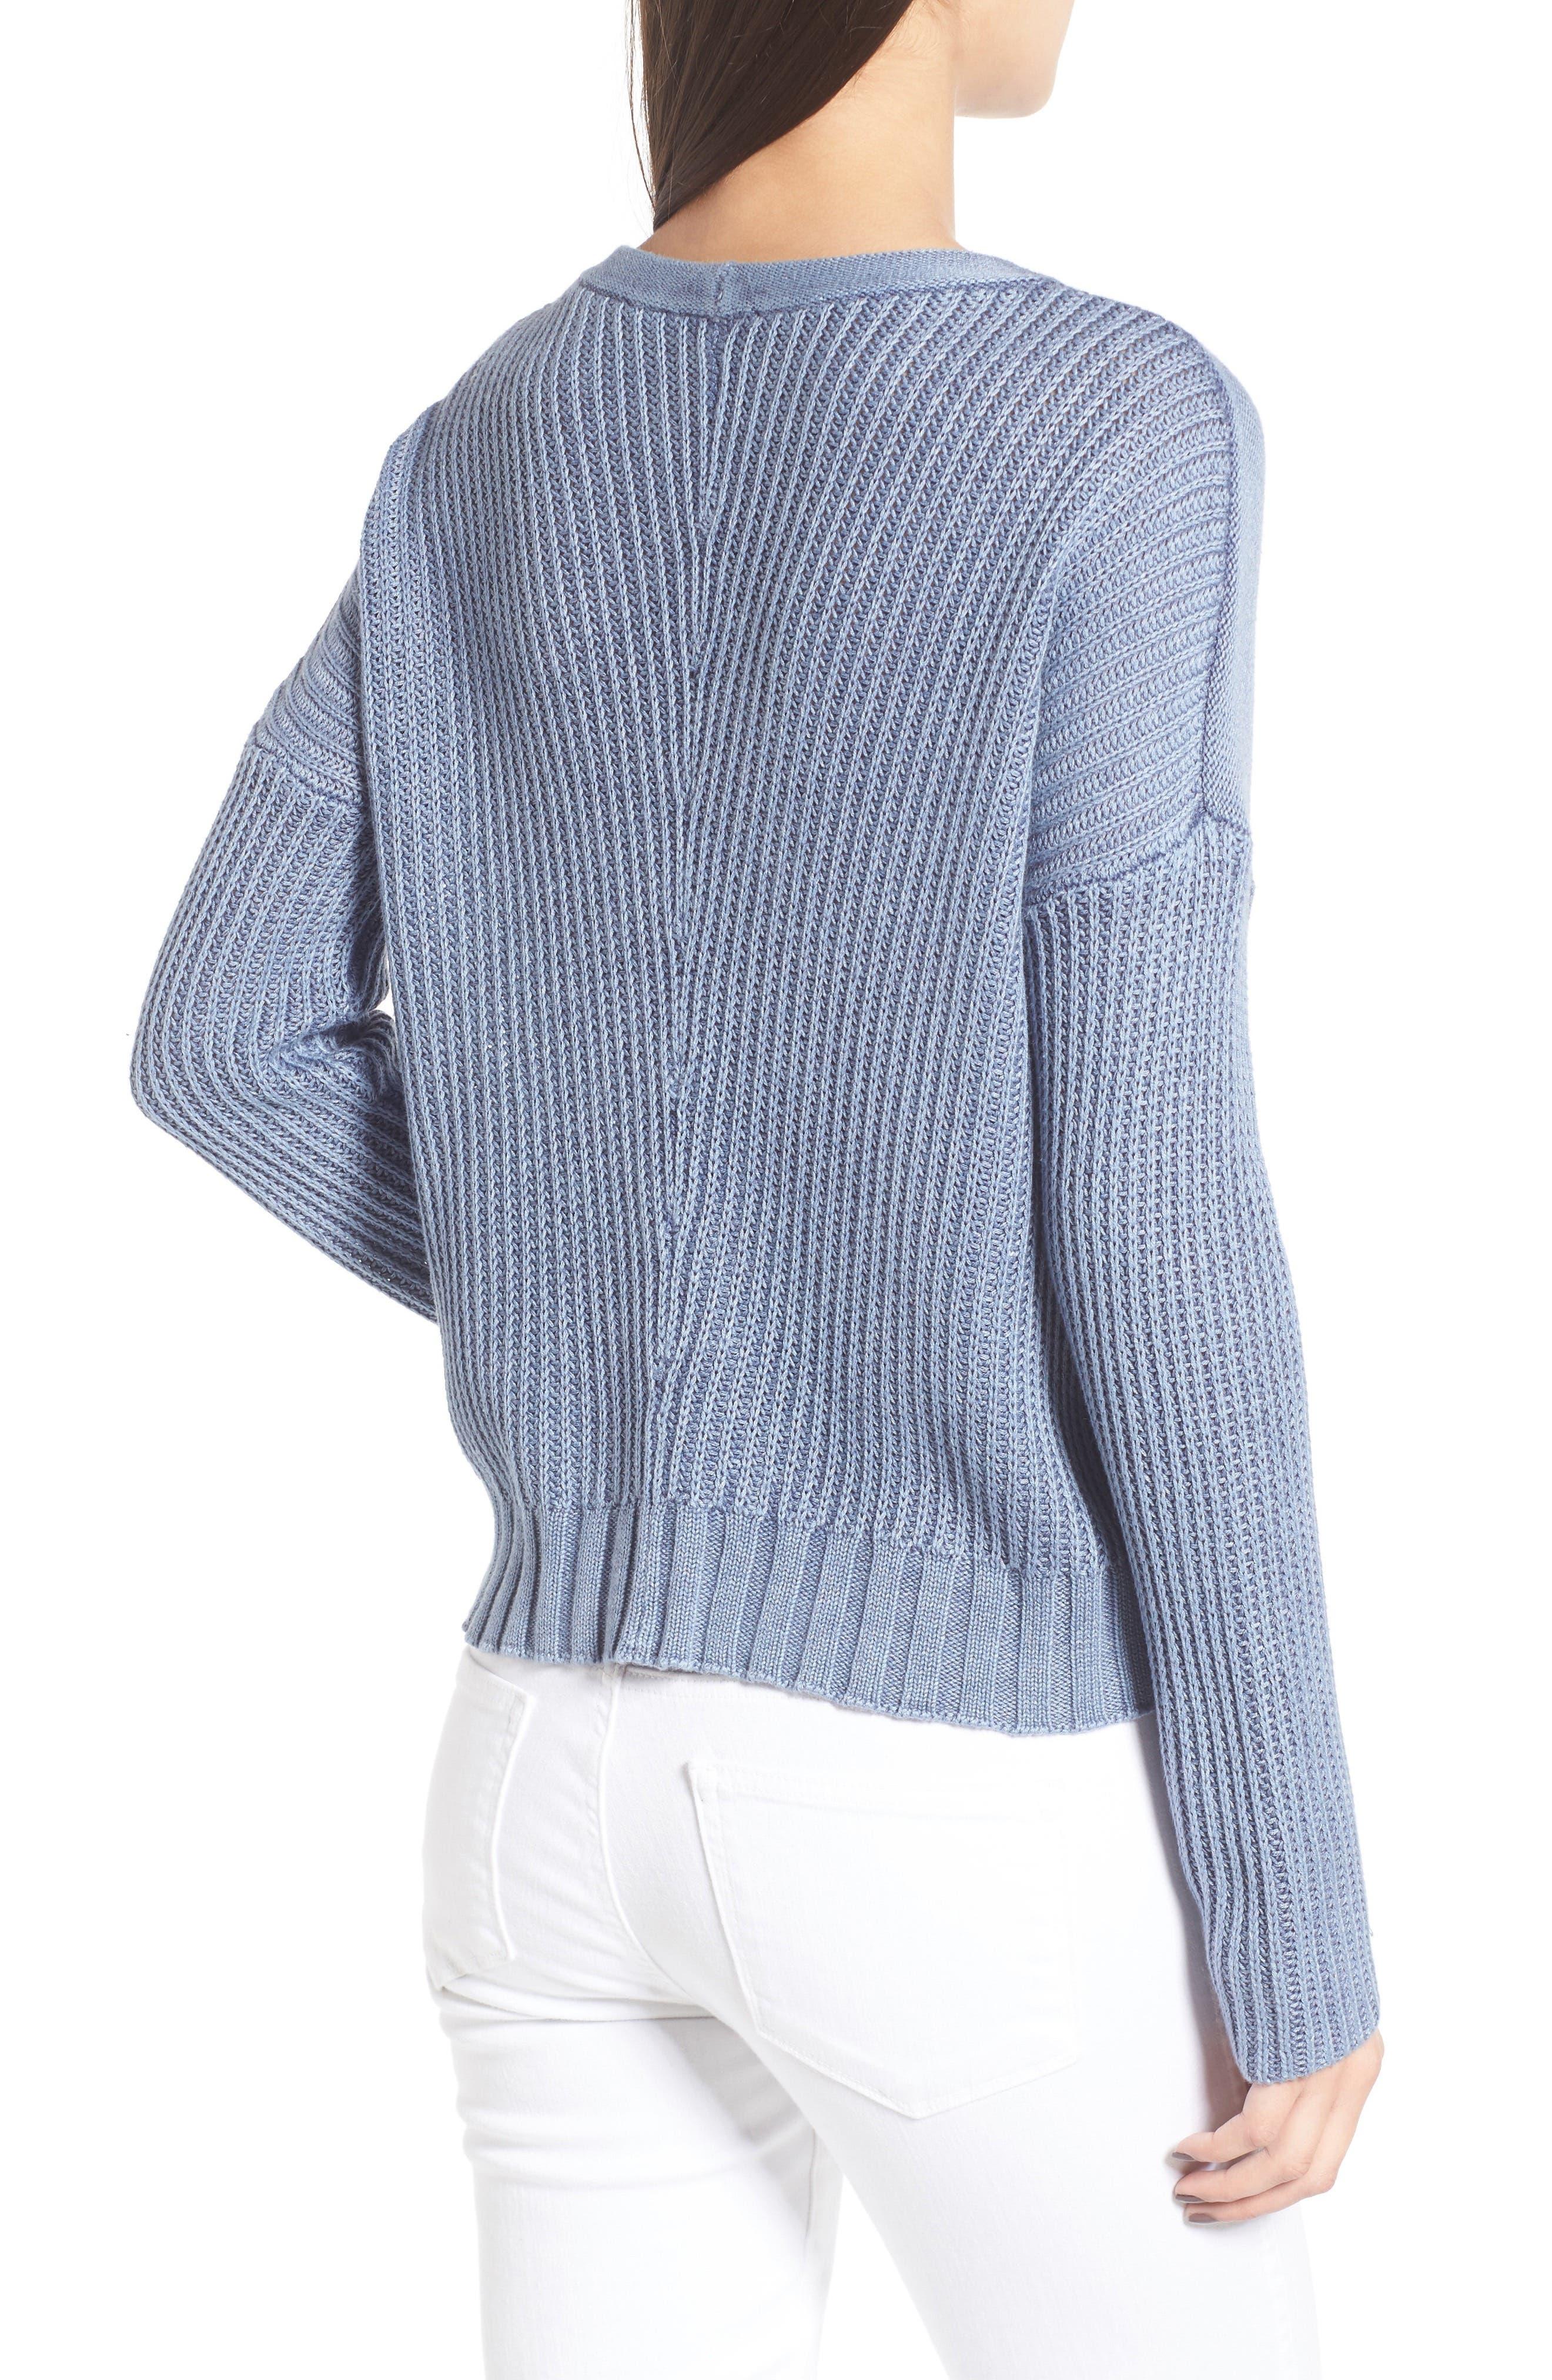 Elsa Sweater,                             Alternate thumbnail 2, color,                             490